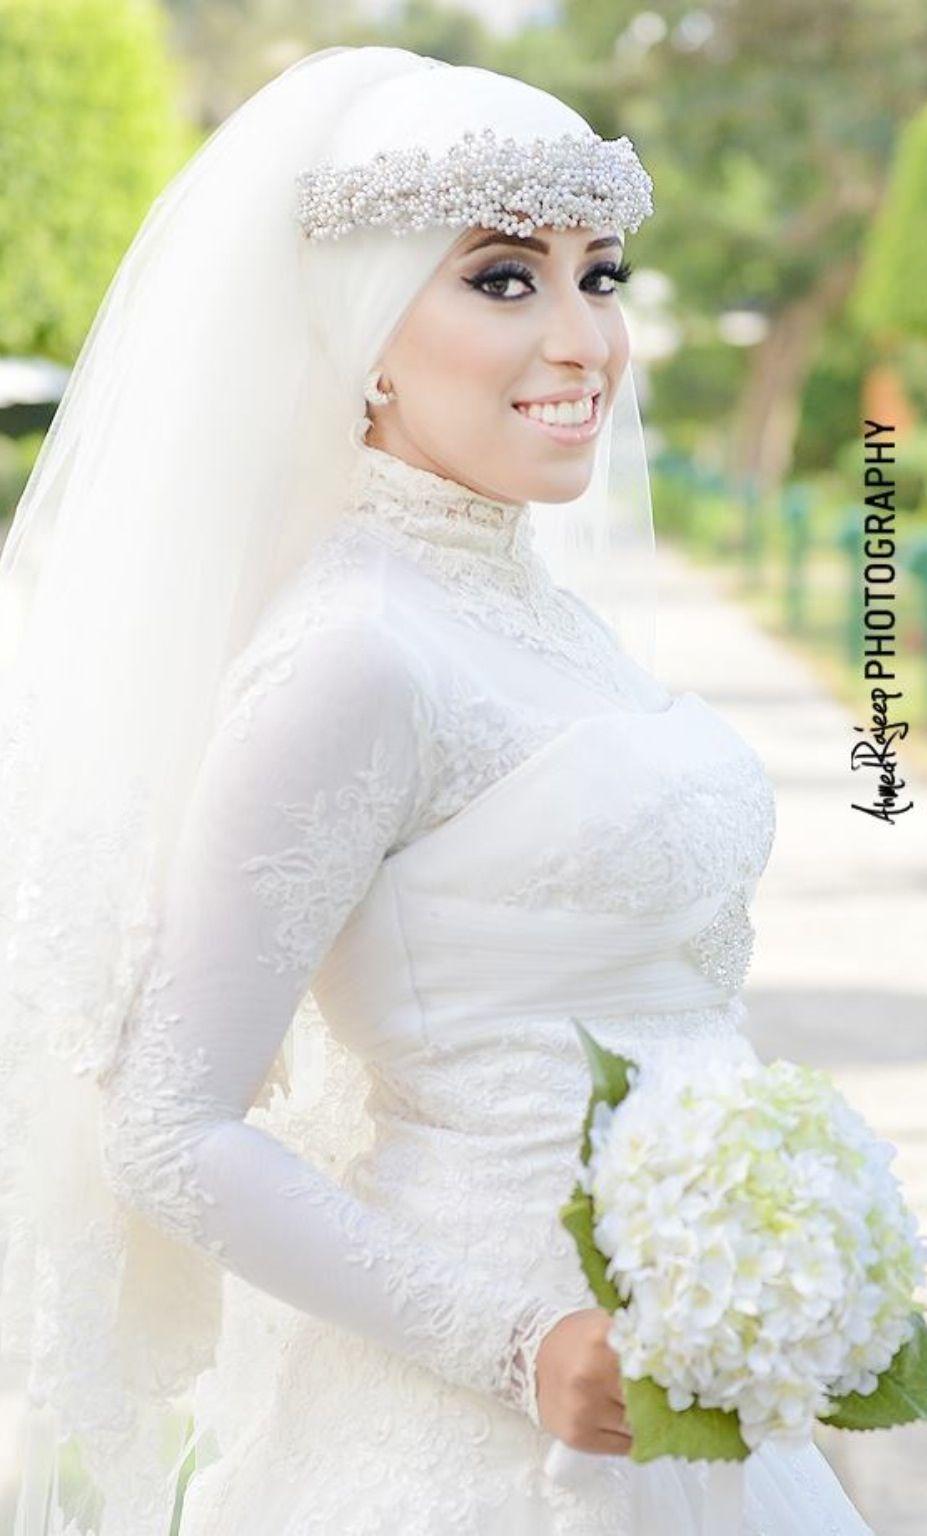 egyptian bride. muslim wedding